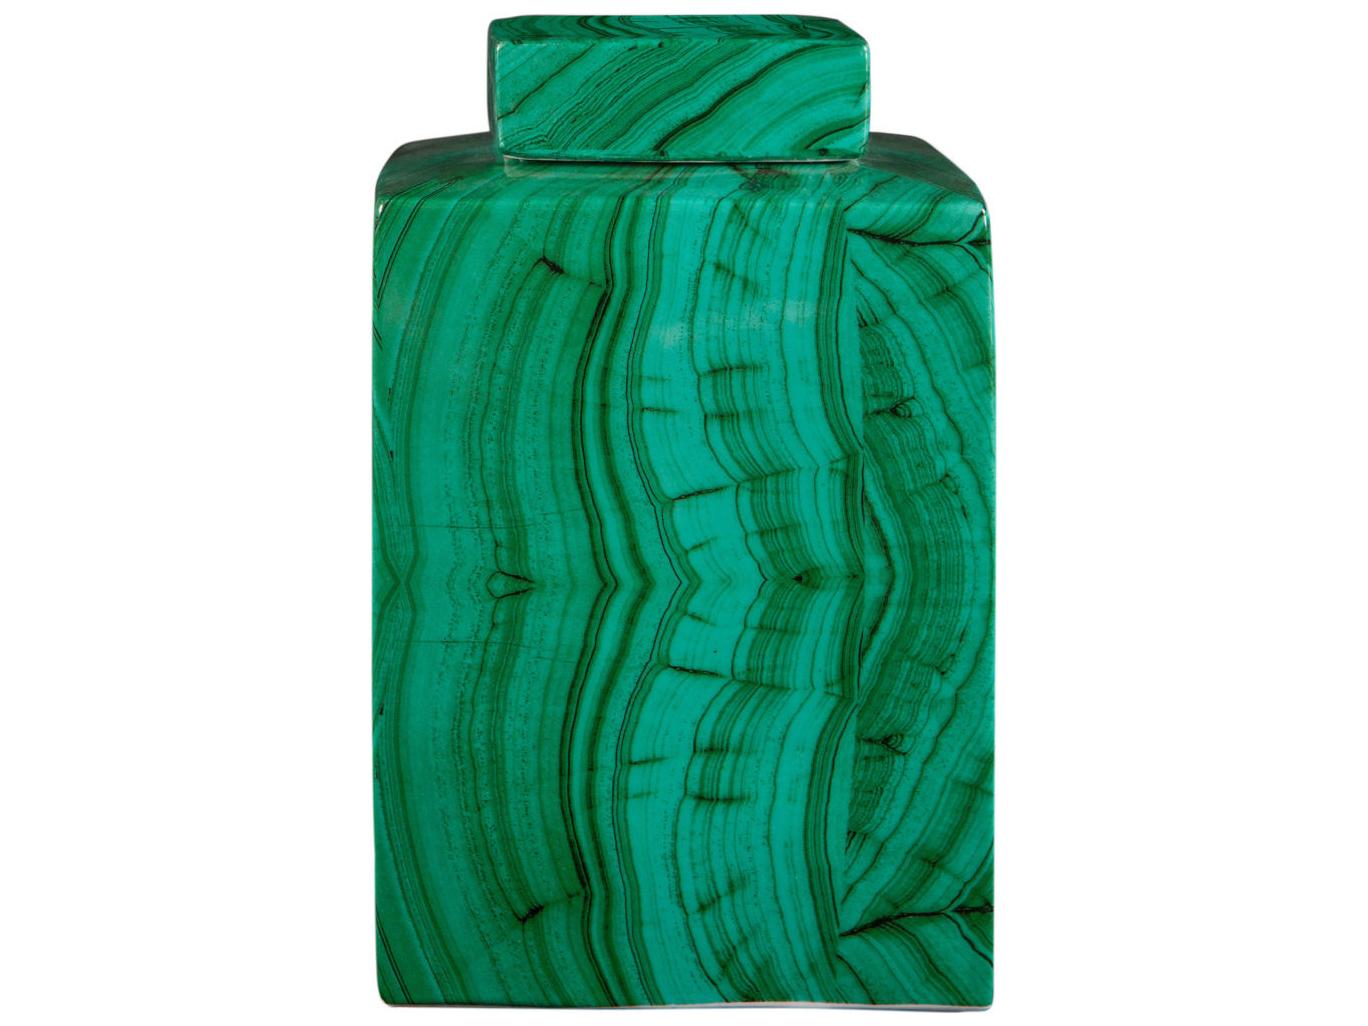 Ваза GemsВазы<br><br><br>Material: Керамика<br>Ширина см: 18<br>Высота см: 31<br>Глубина см: 18